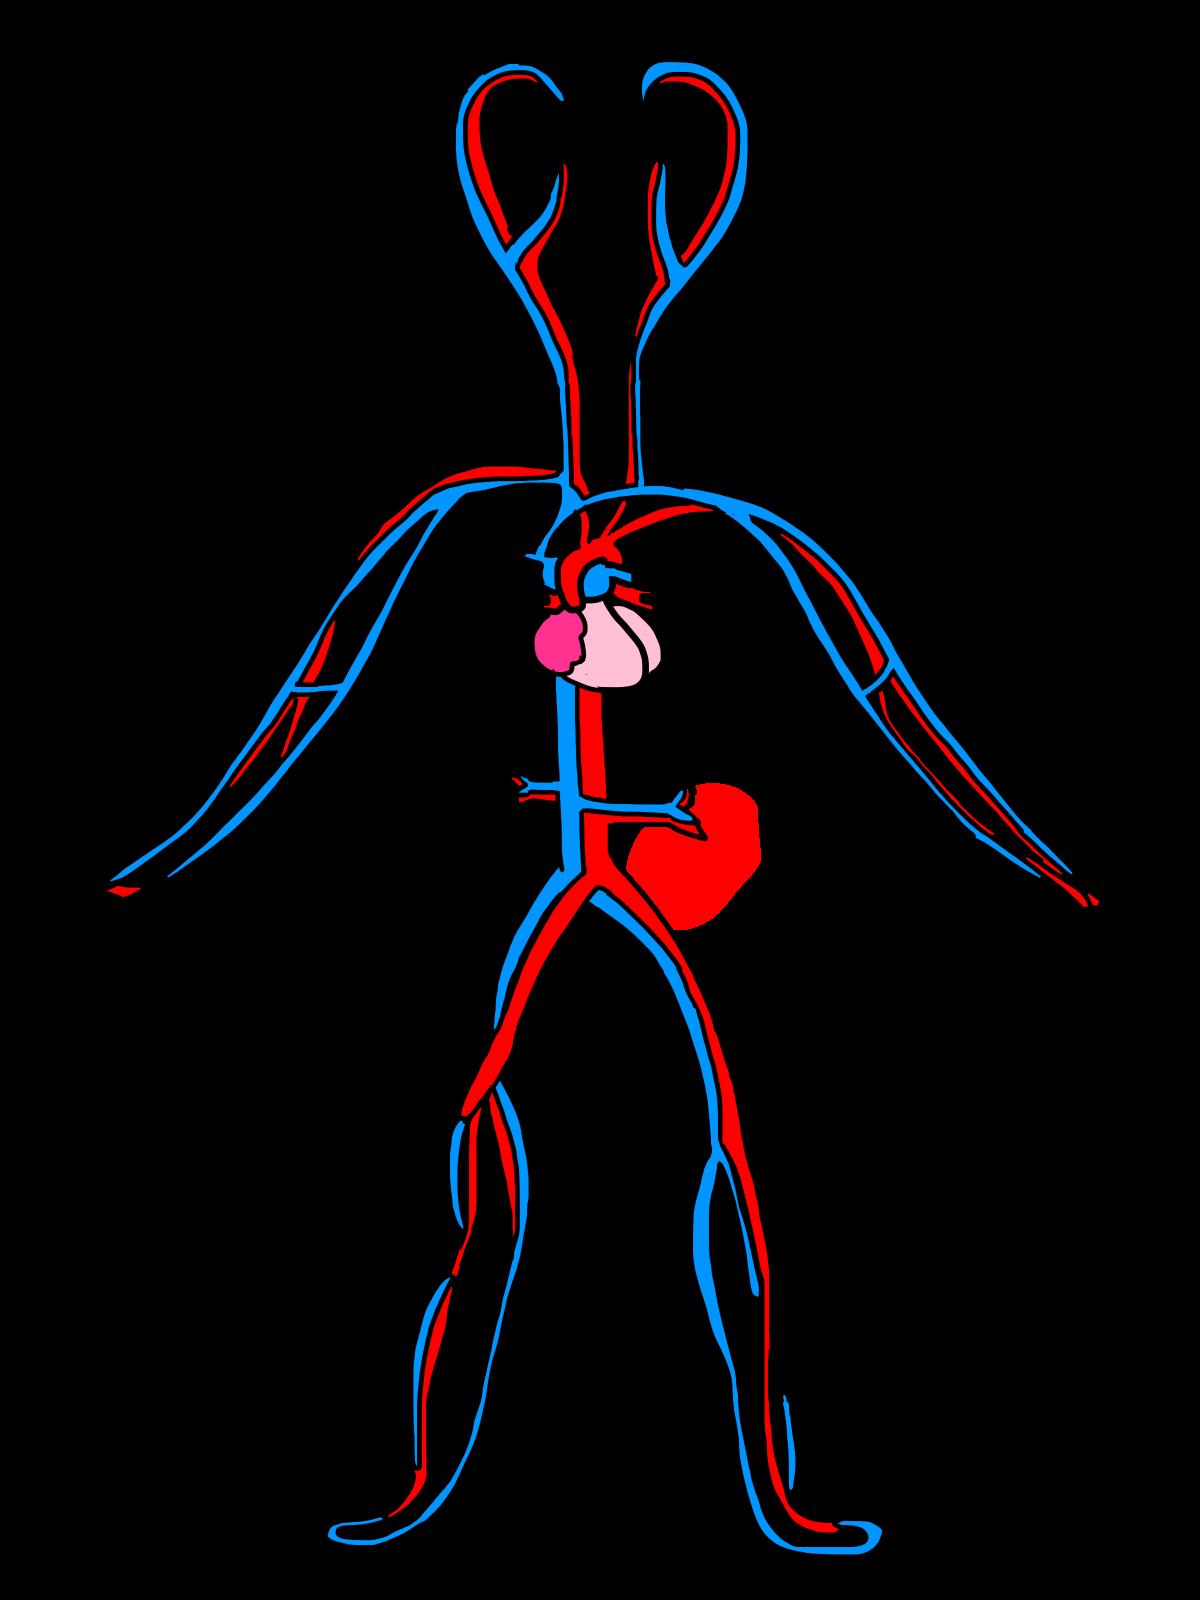 Human clipart 3d human. Image of circulatory system